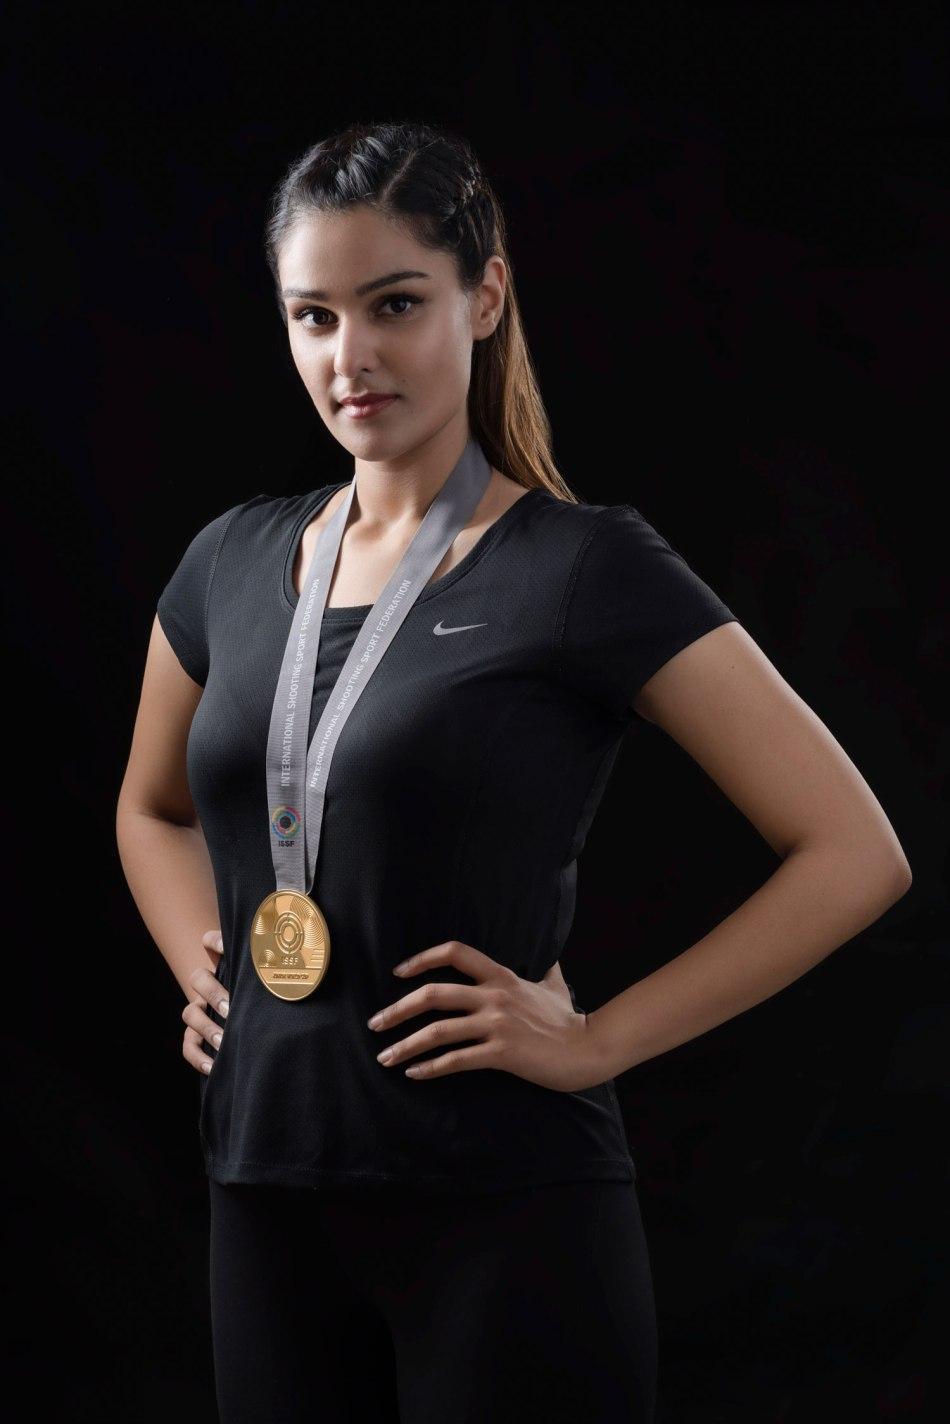 Gauri-Sheoran-medal-eshe